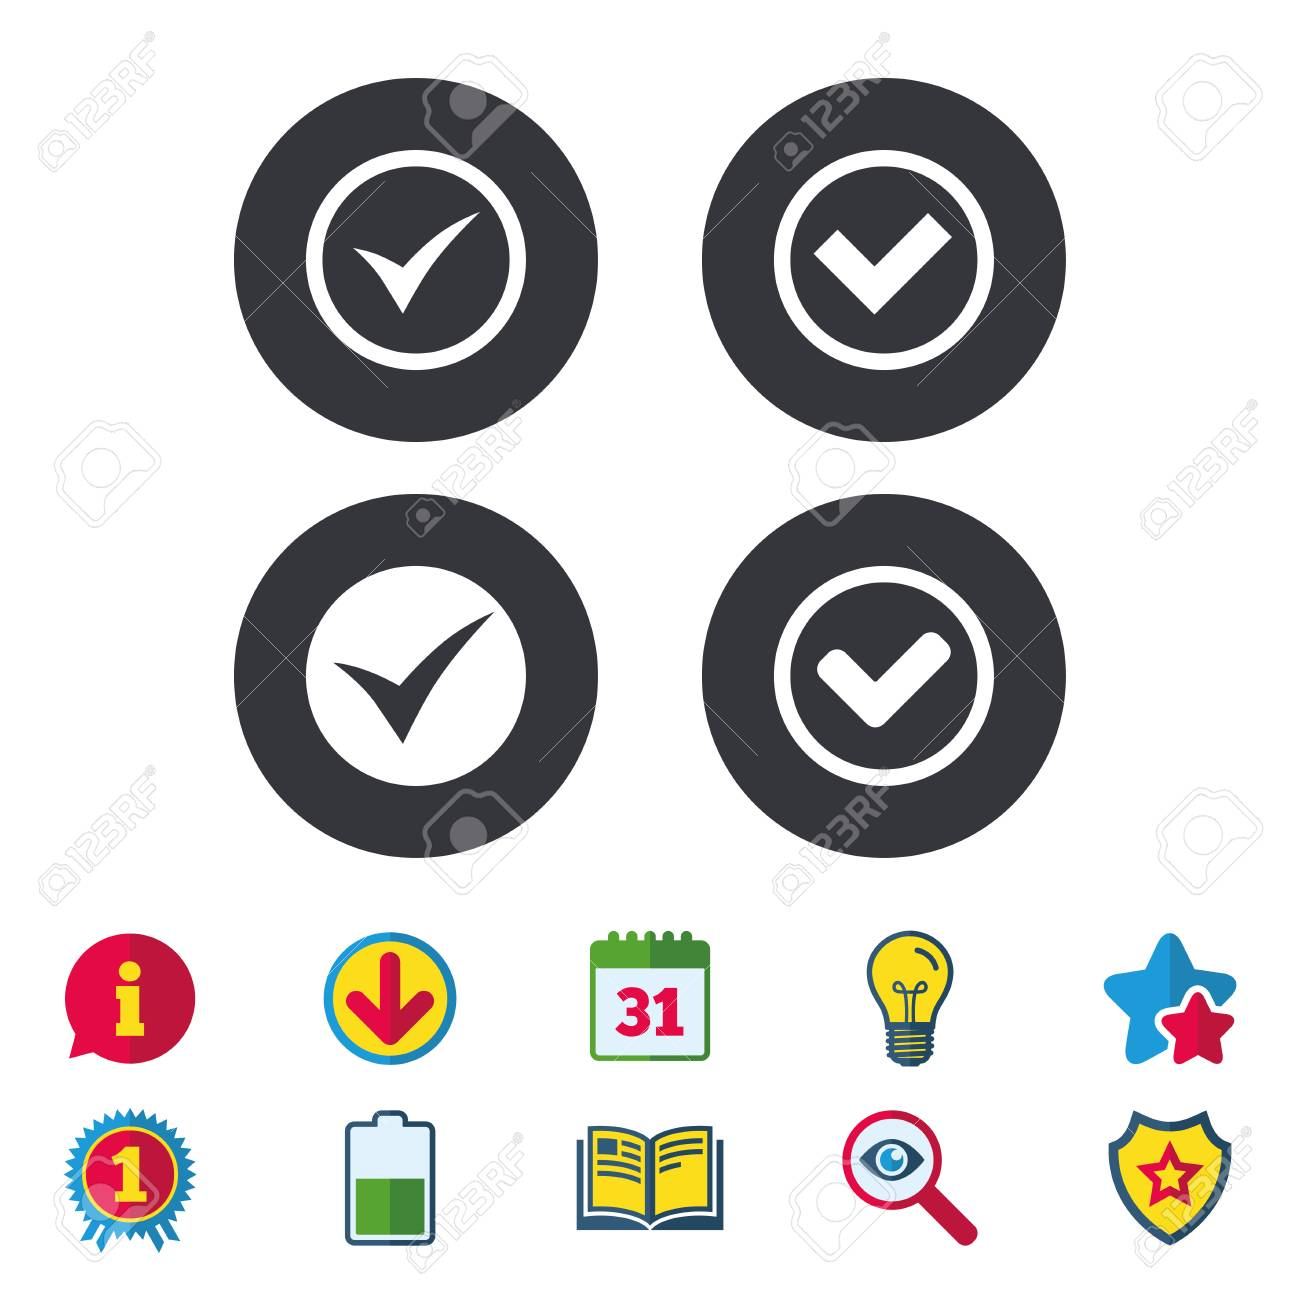 Check icons  Checkbox confirm circle sign symbols  Calendar,